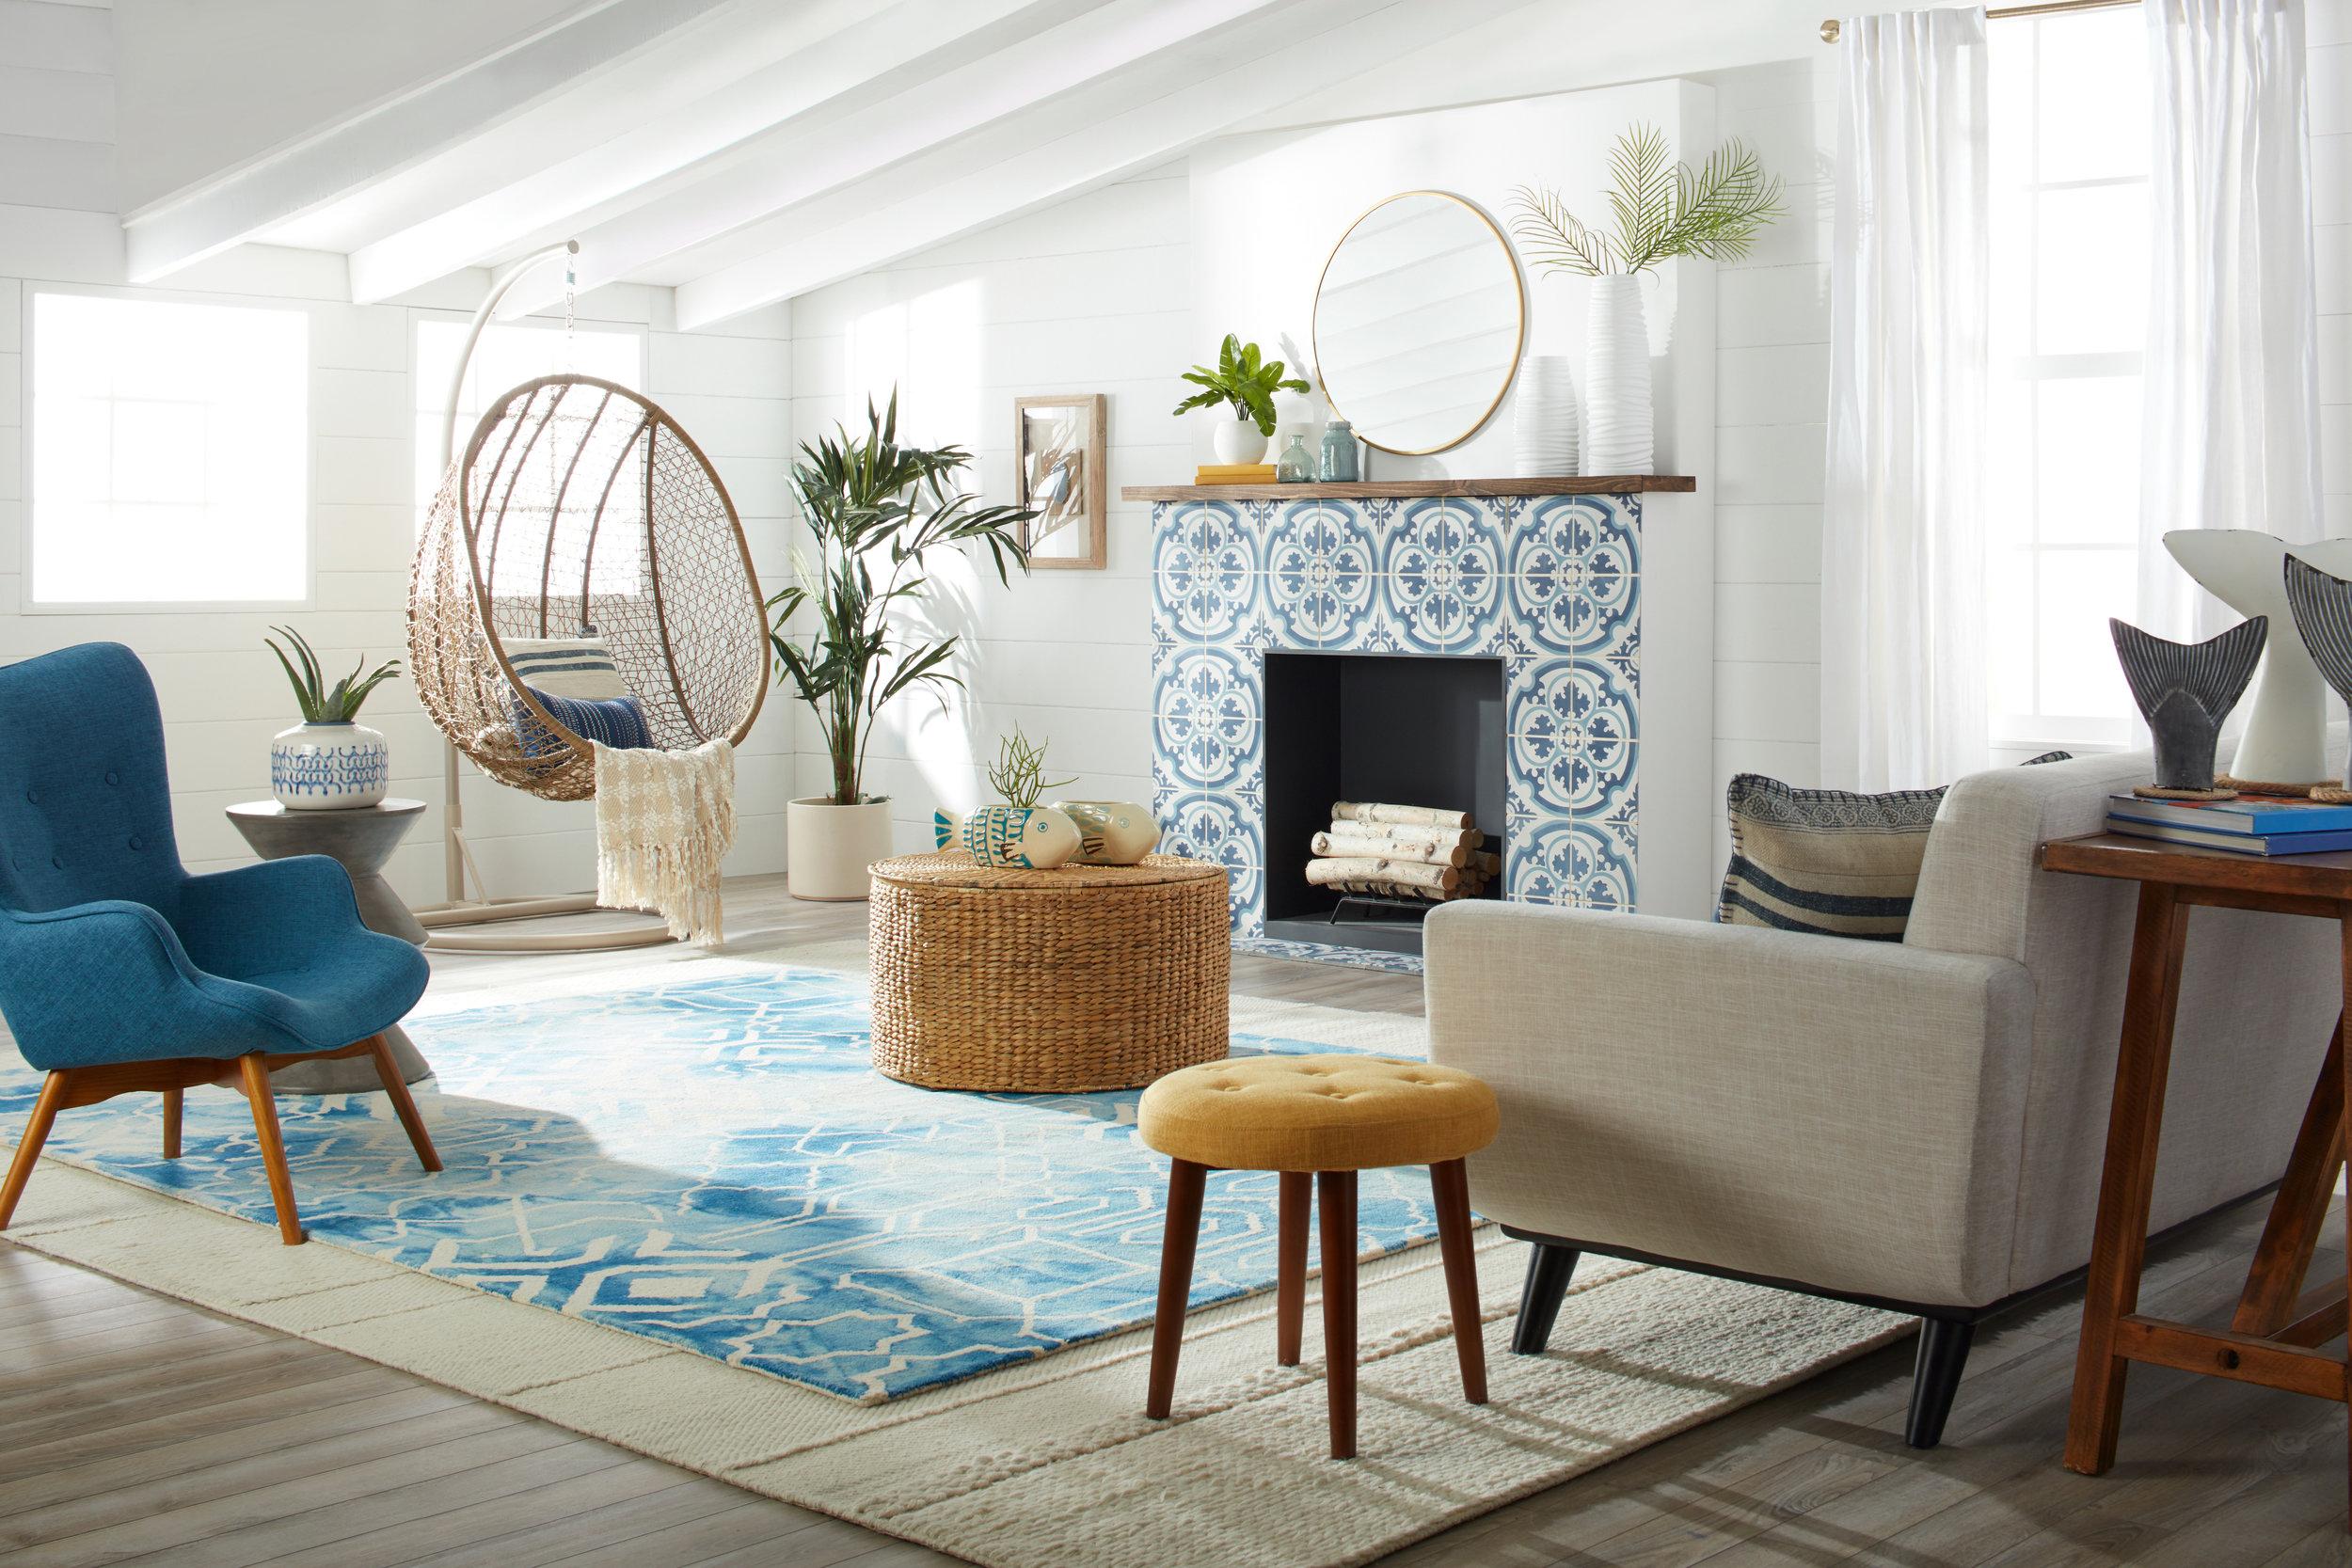 SEO_Beach_House_Living_1250x750.jpg